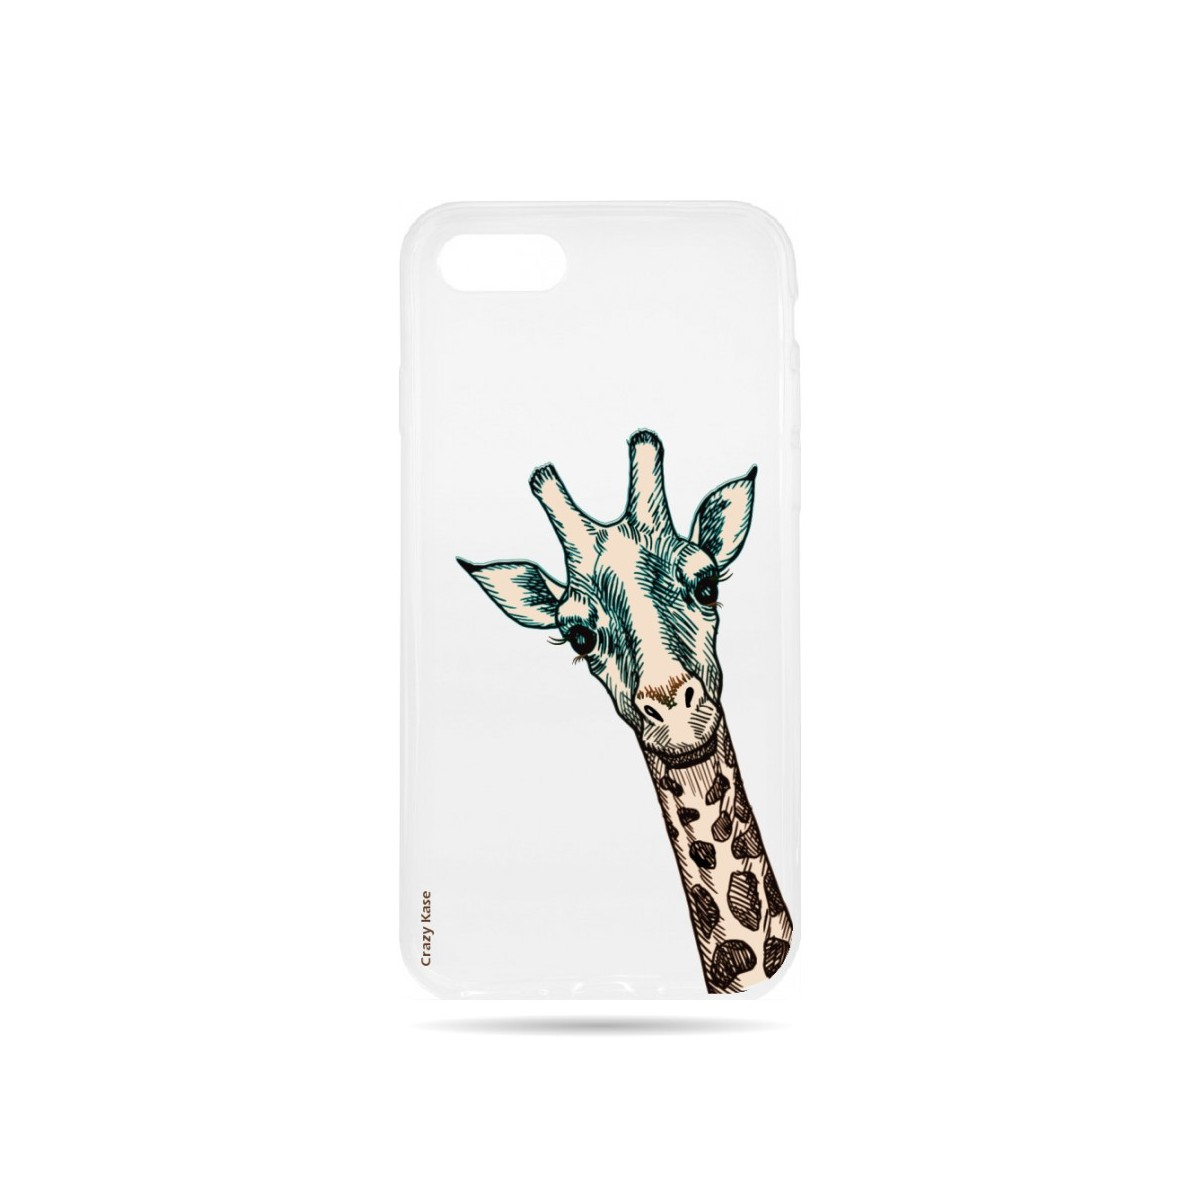 Coque iPhone 7 Transparente souple motif Tête de Girafe - Crazy Kase